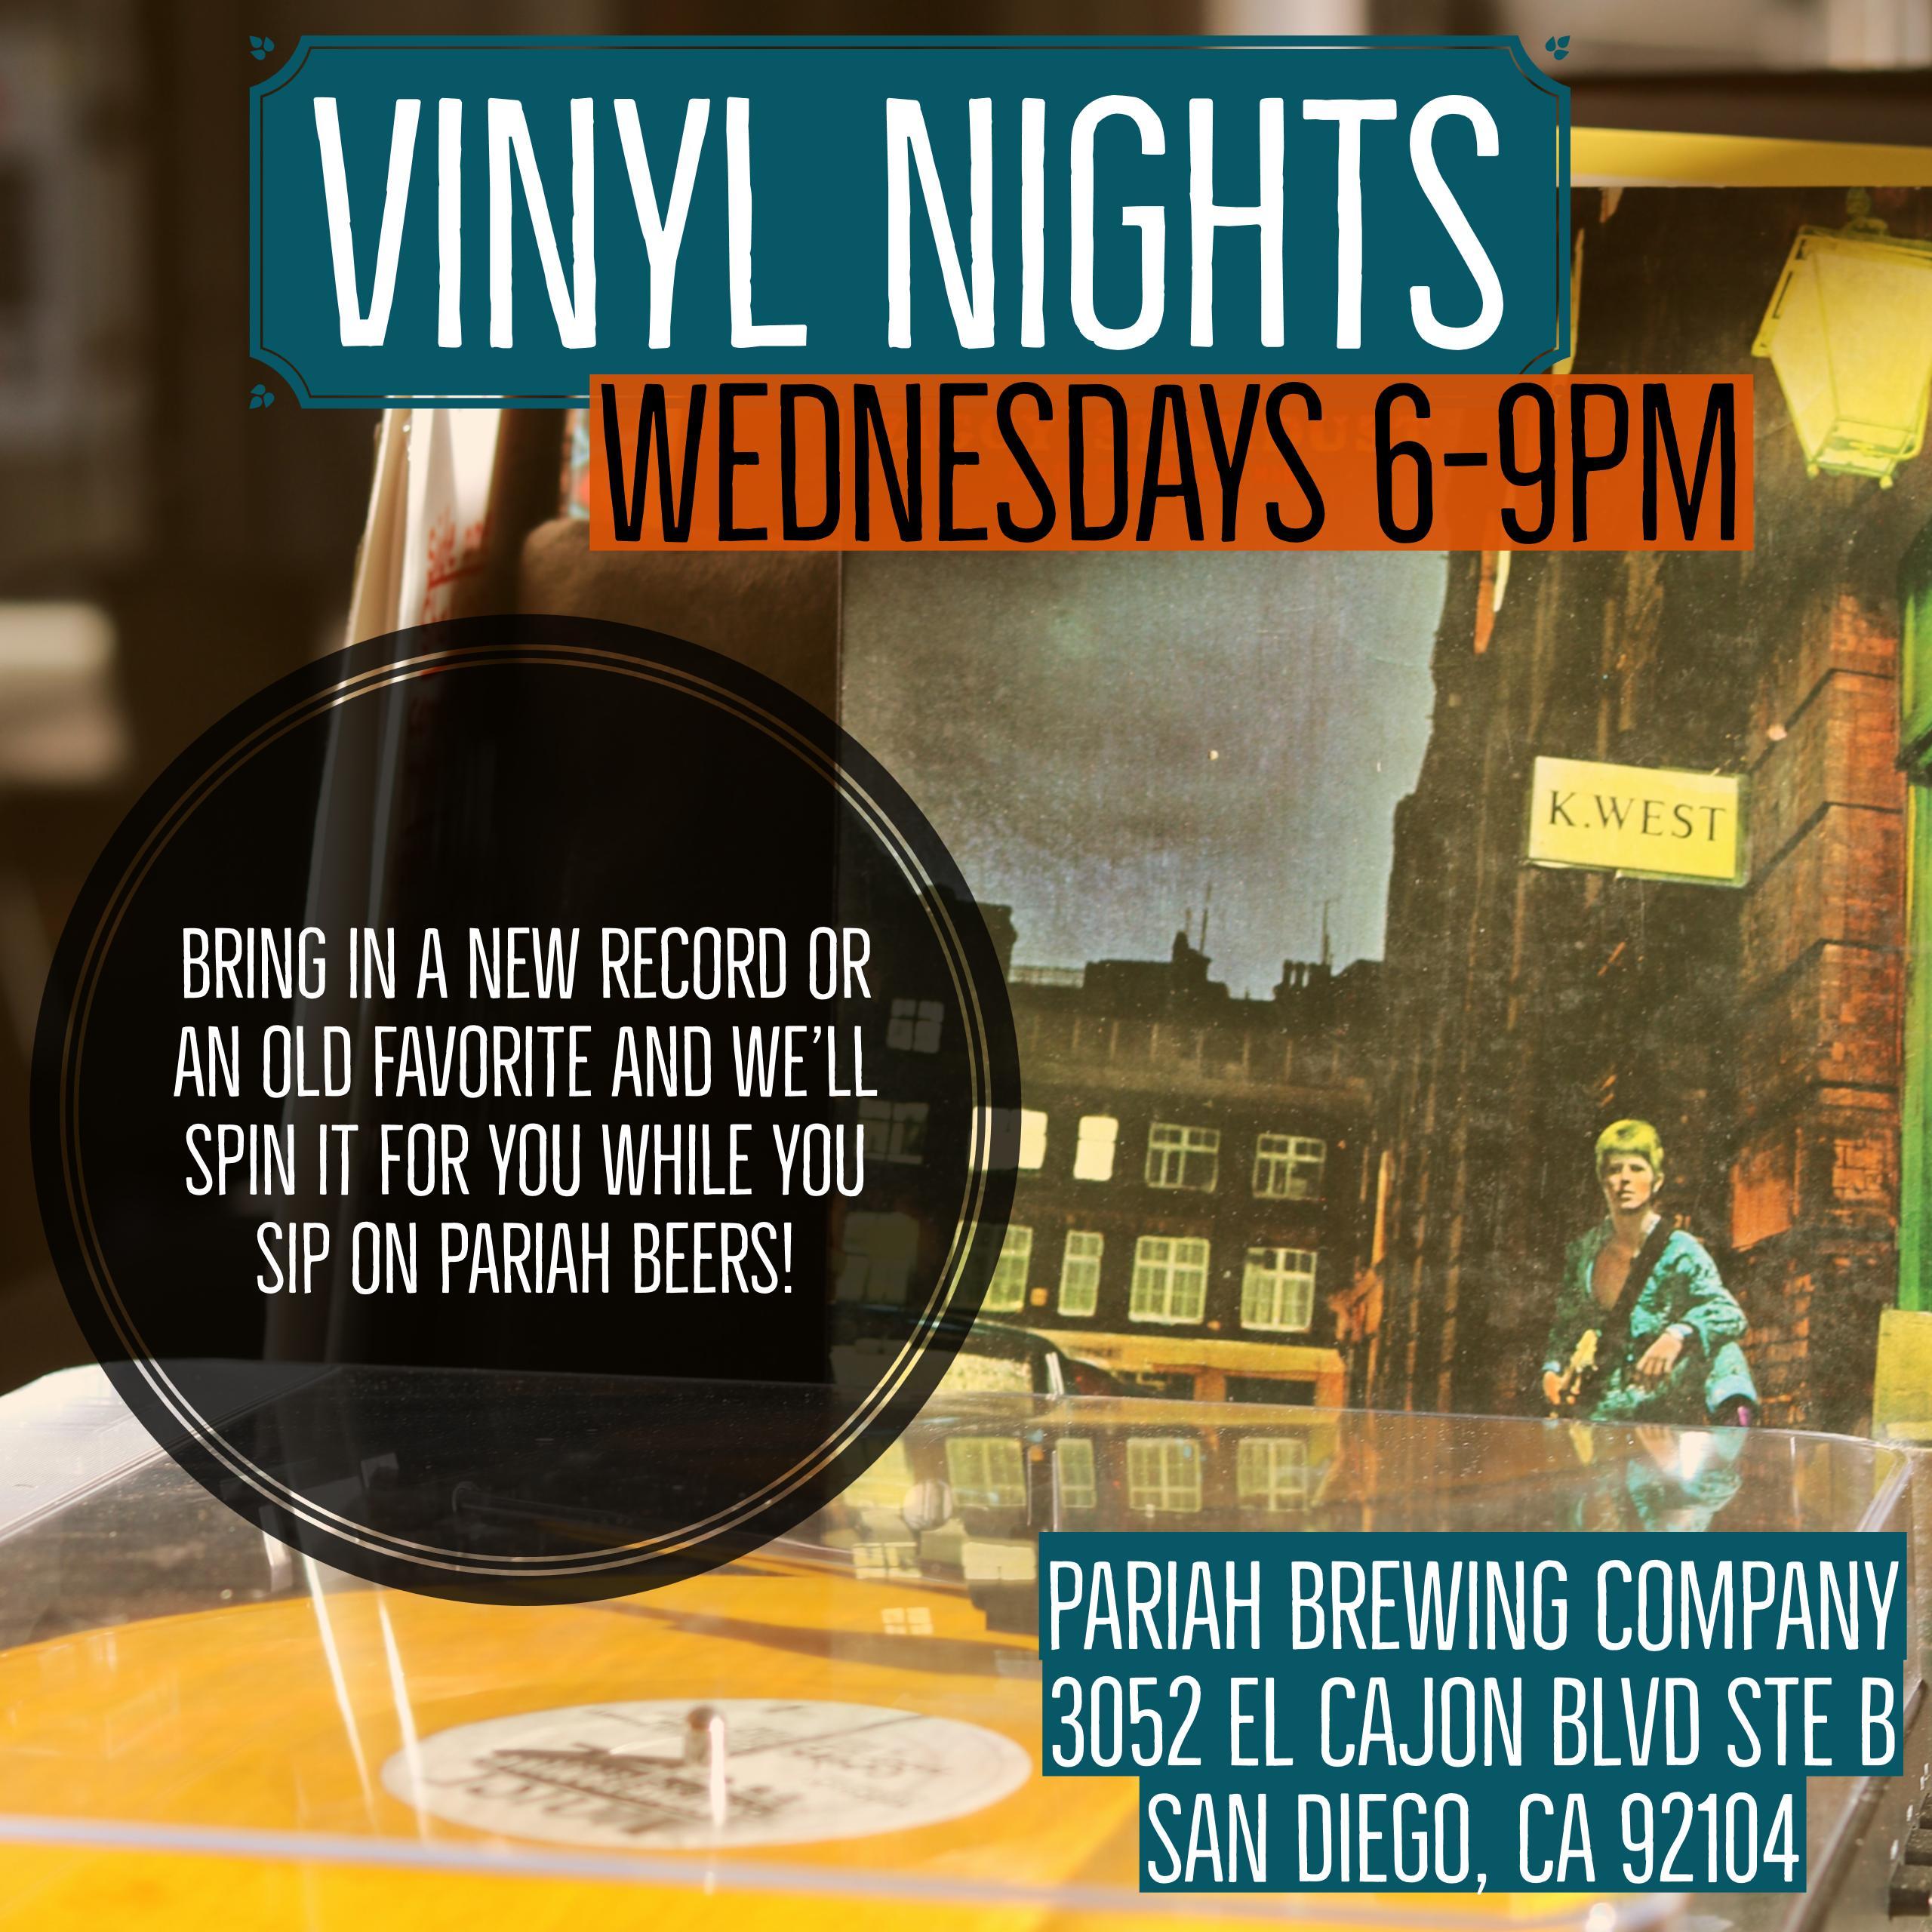 Vinyl Night Wednesdays